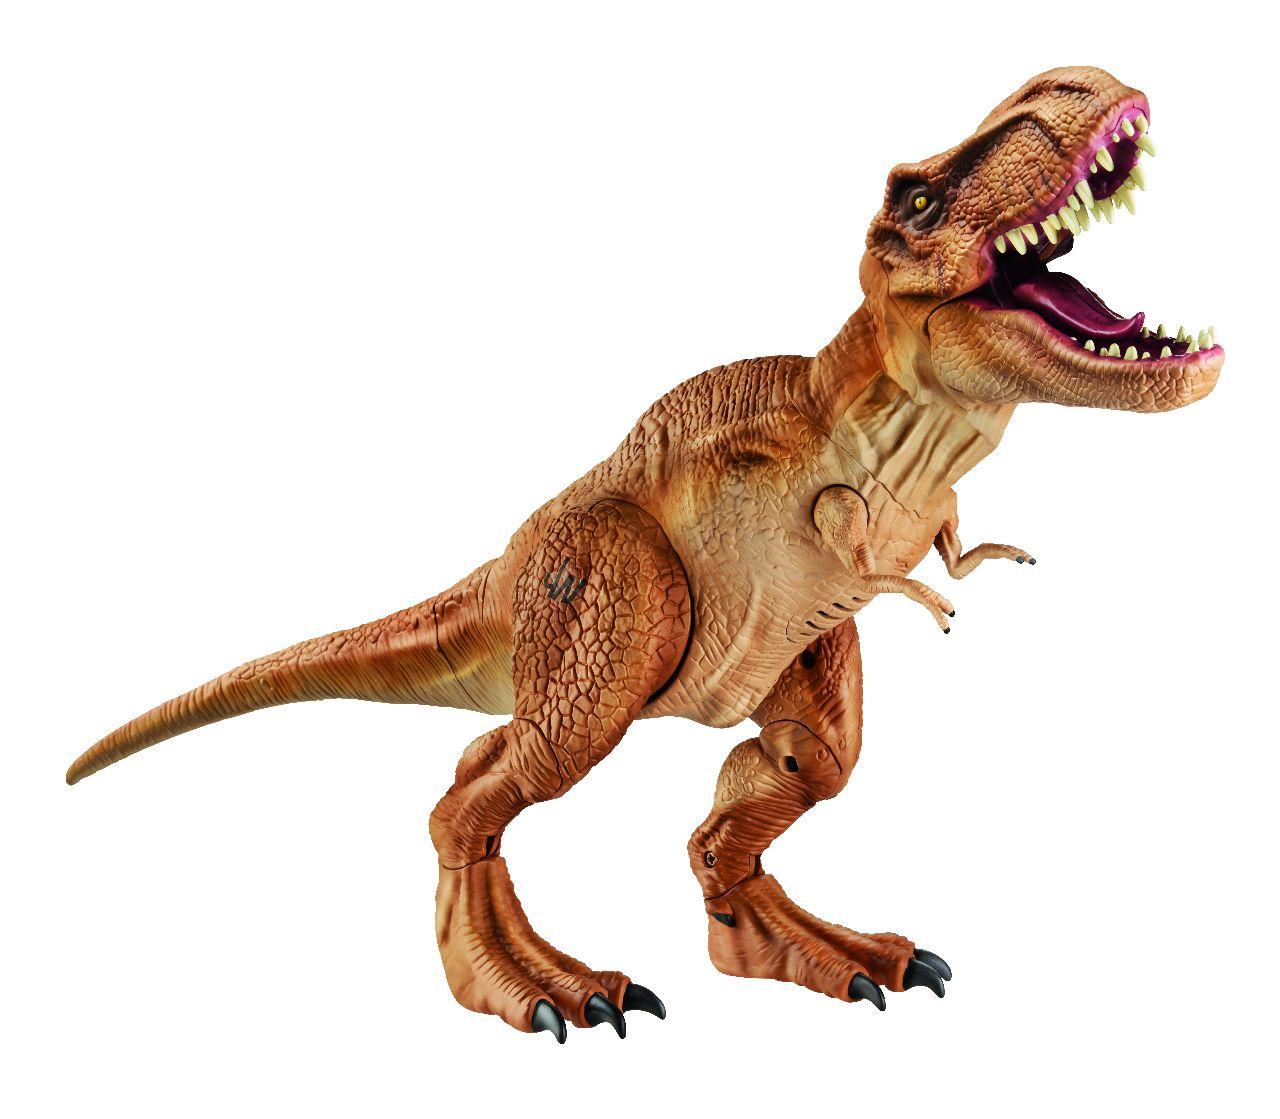 T Rex 3 Roaring In Jurassic Park Classic Campagna Trex 16s Powered By Bmw K1600 Motorcycle Magazine Image World Stomp Strike Tyrannosaurus